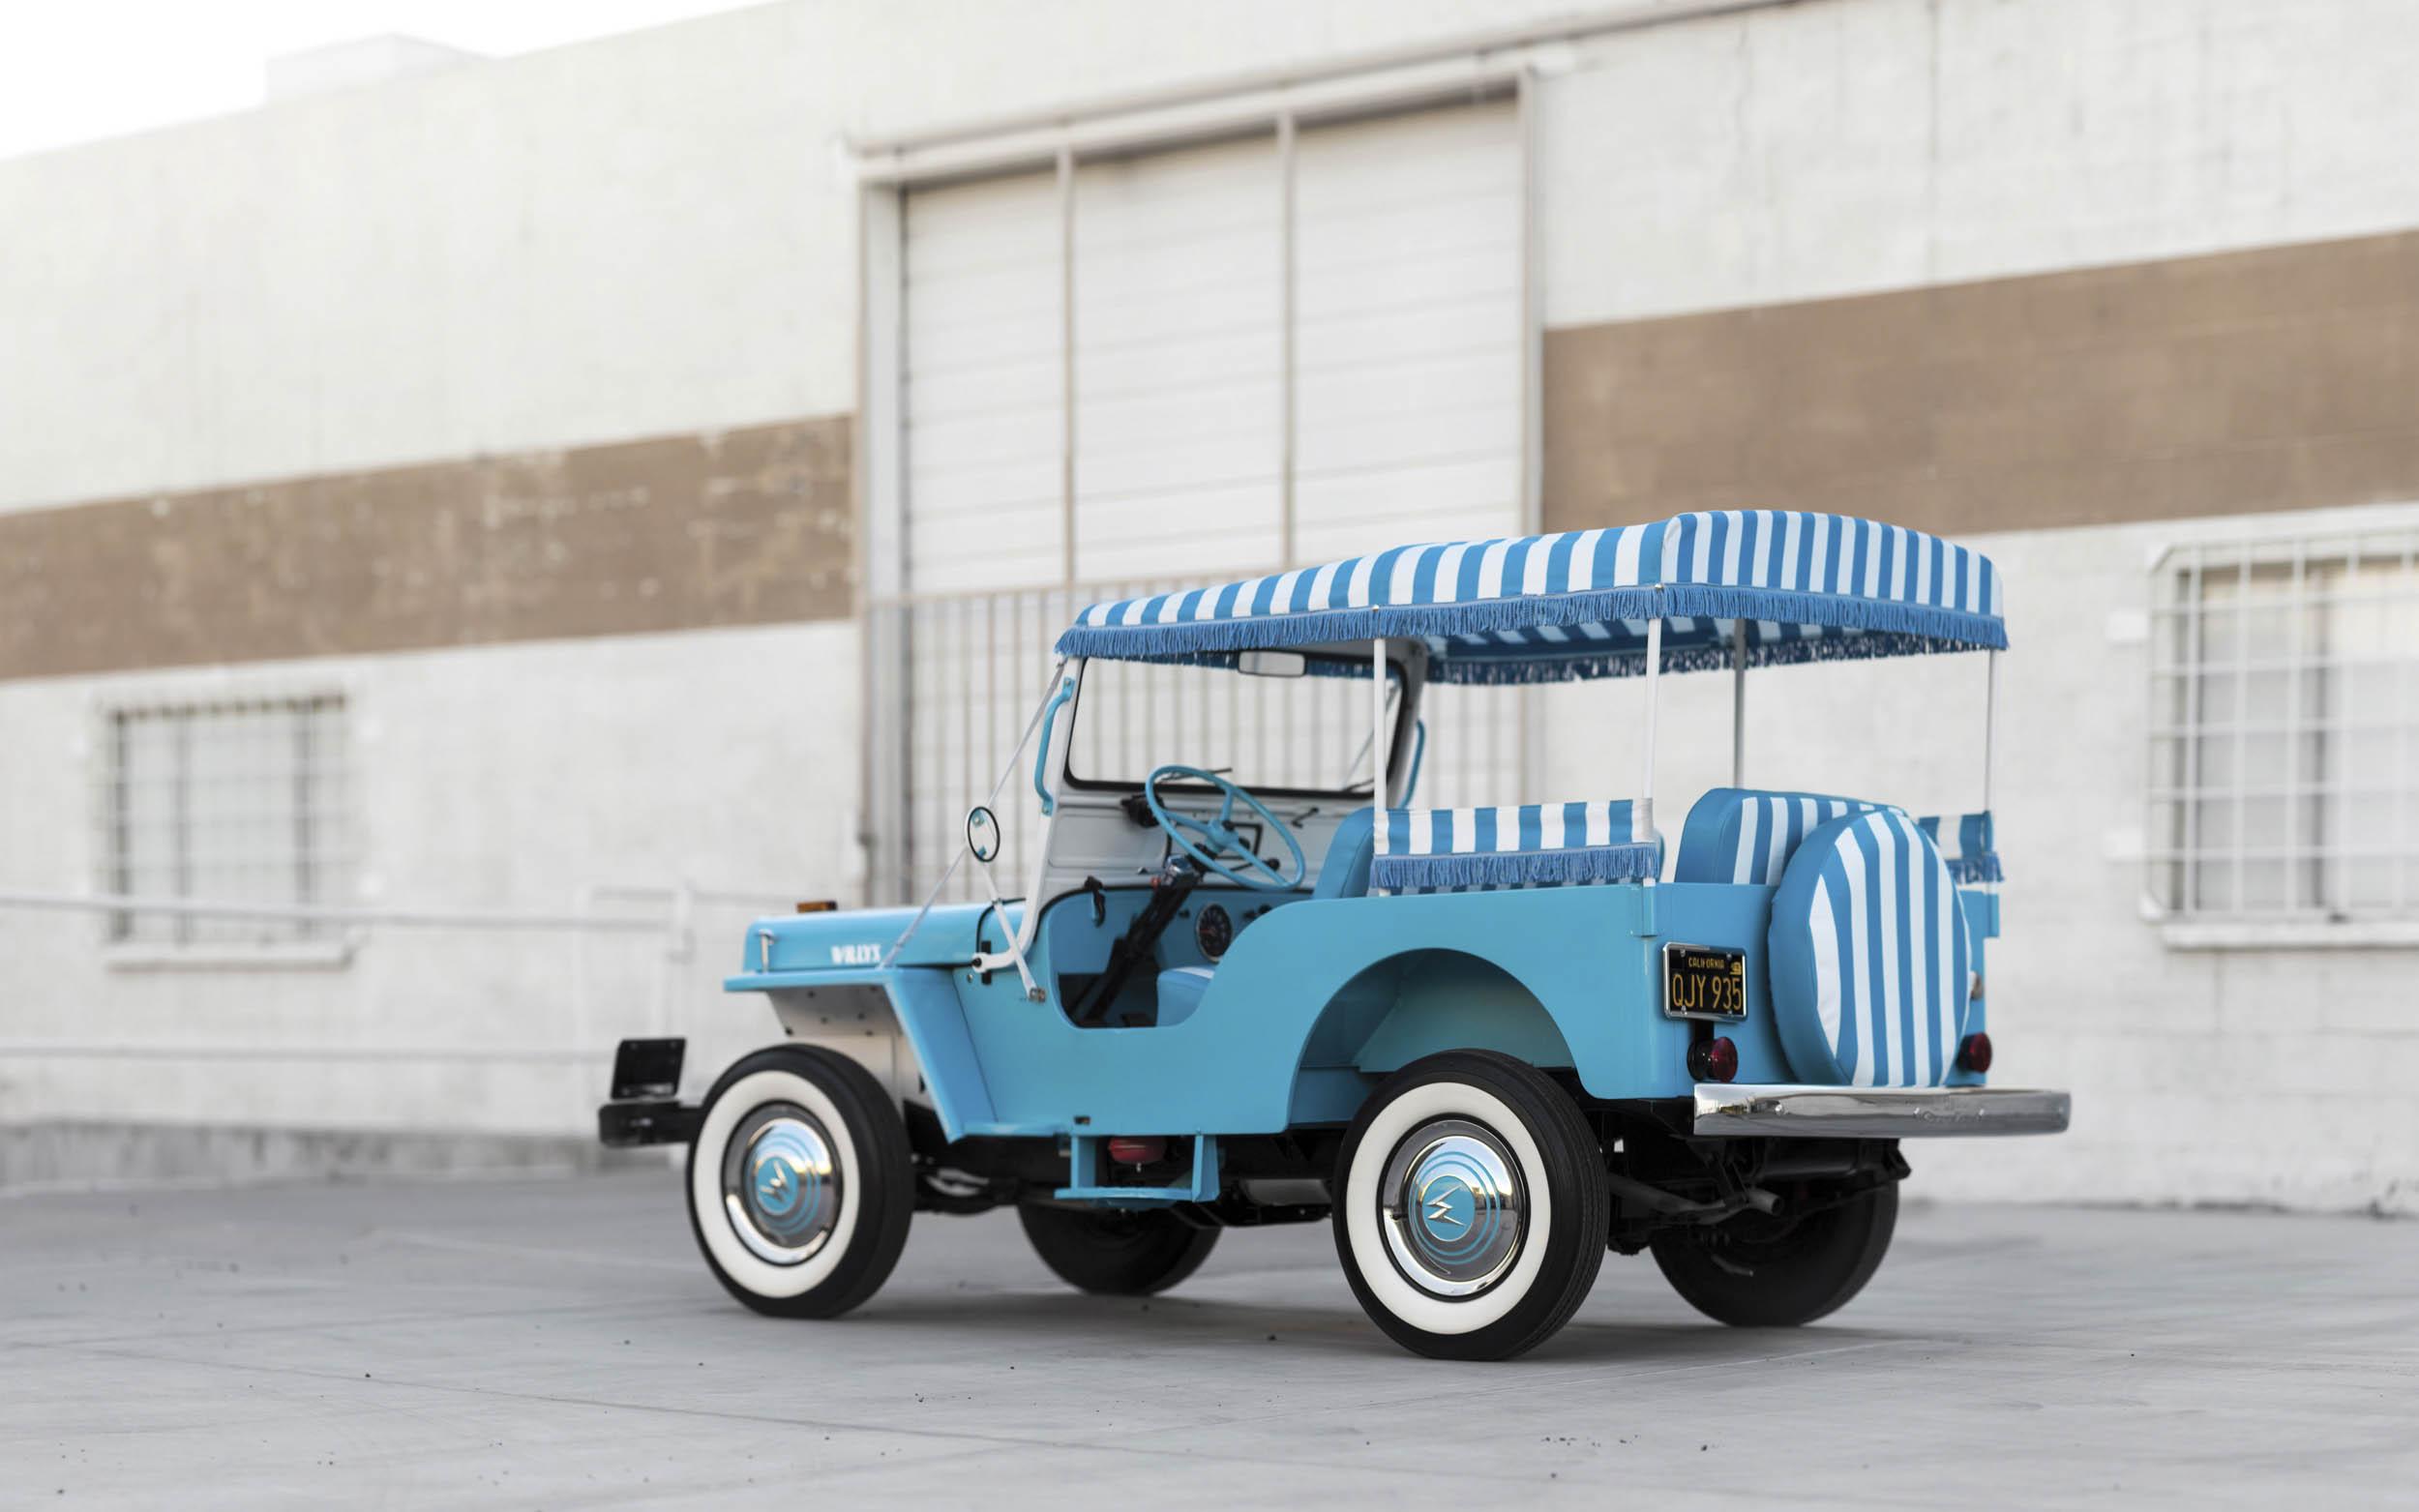 1960 Willys Jeep Gala rear 3/4